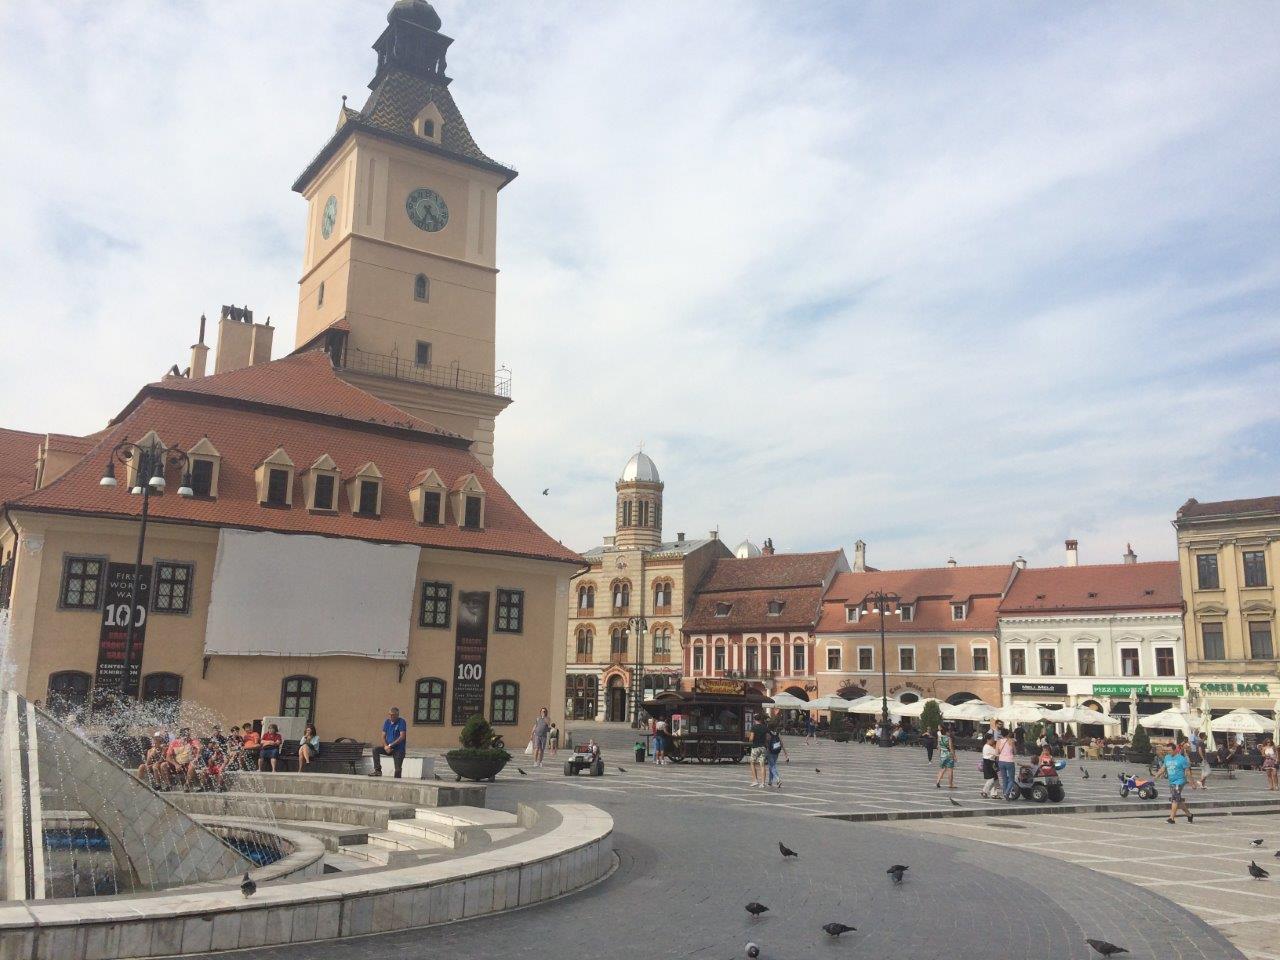 The City Hall in the main square in Brasov Romania